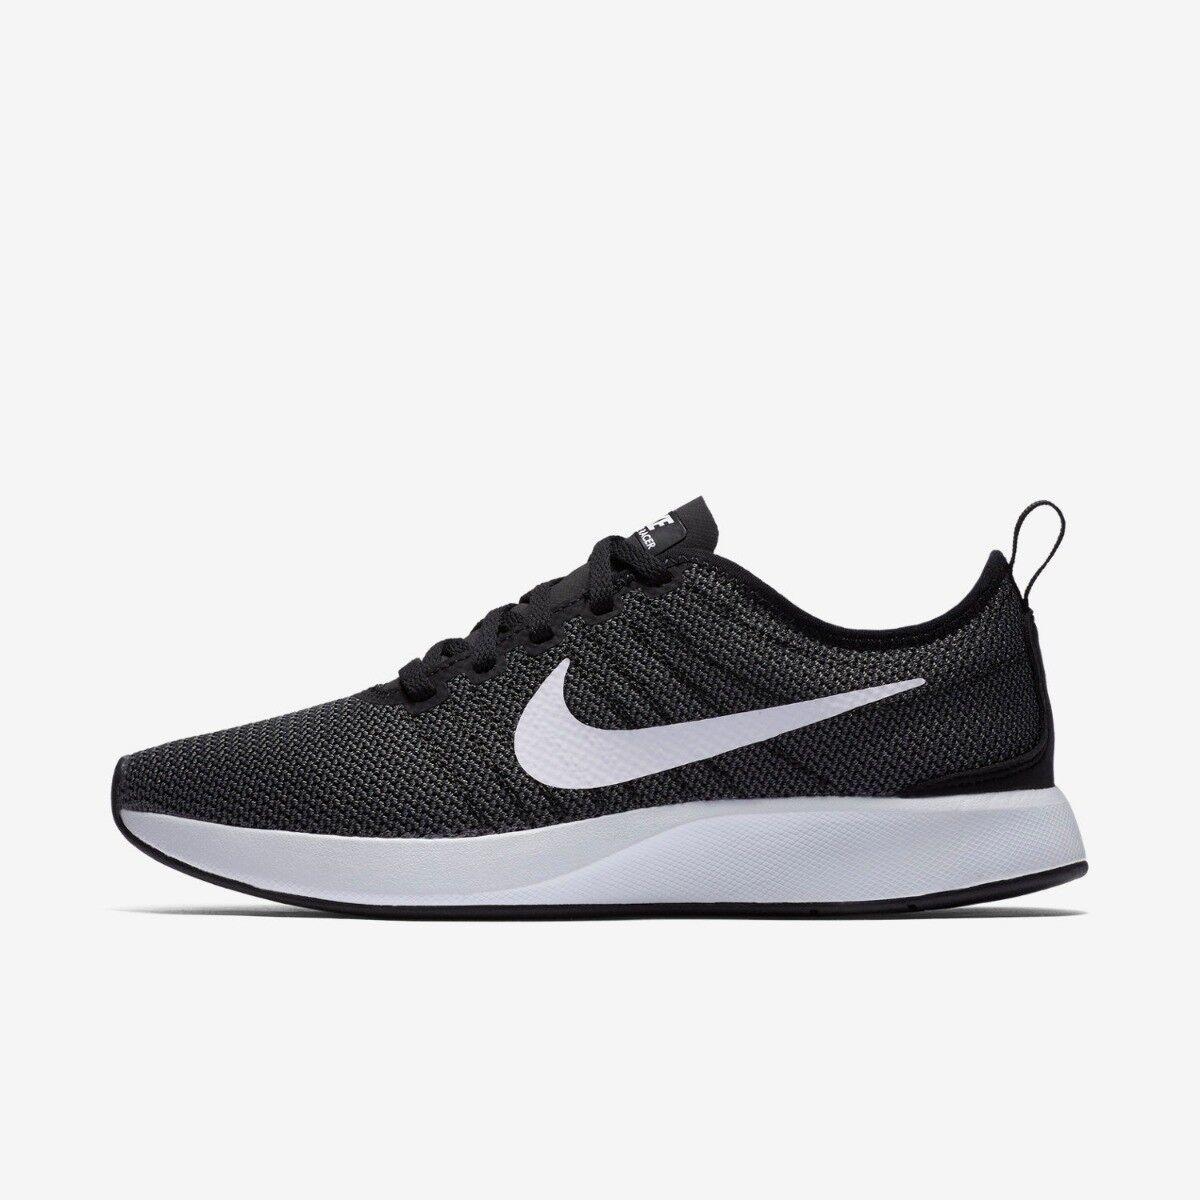 Nike Dualtone Racer Womens Running Trainer shoe Size 4 -7.5 Black White Grey New